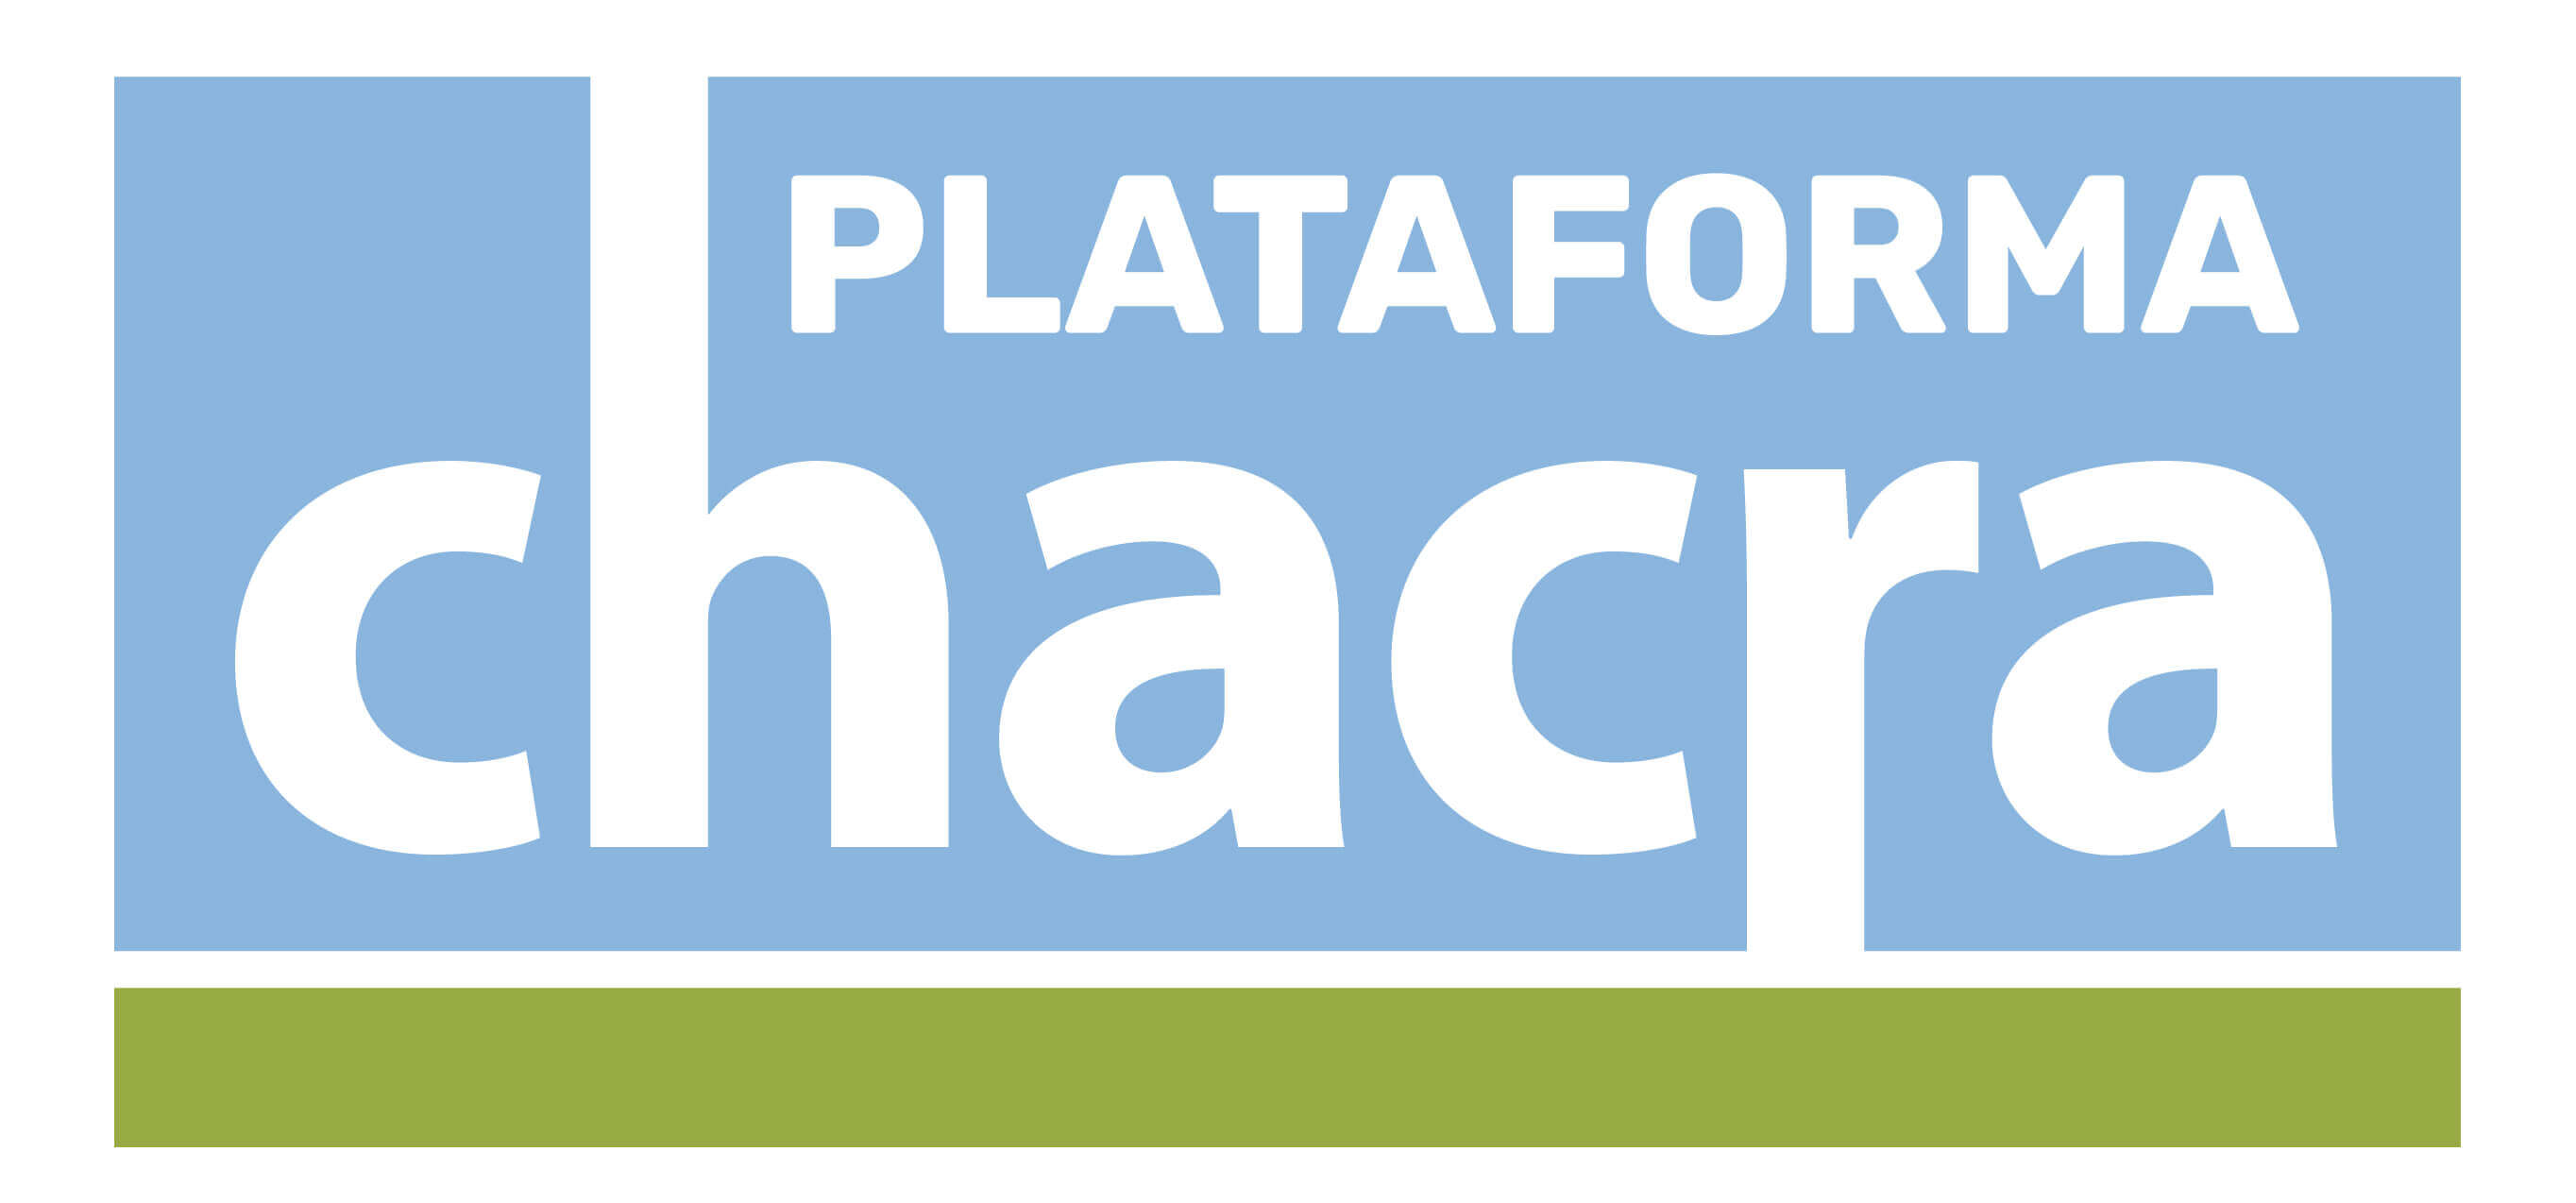 Plataforma Chacra